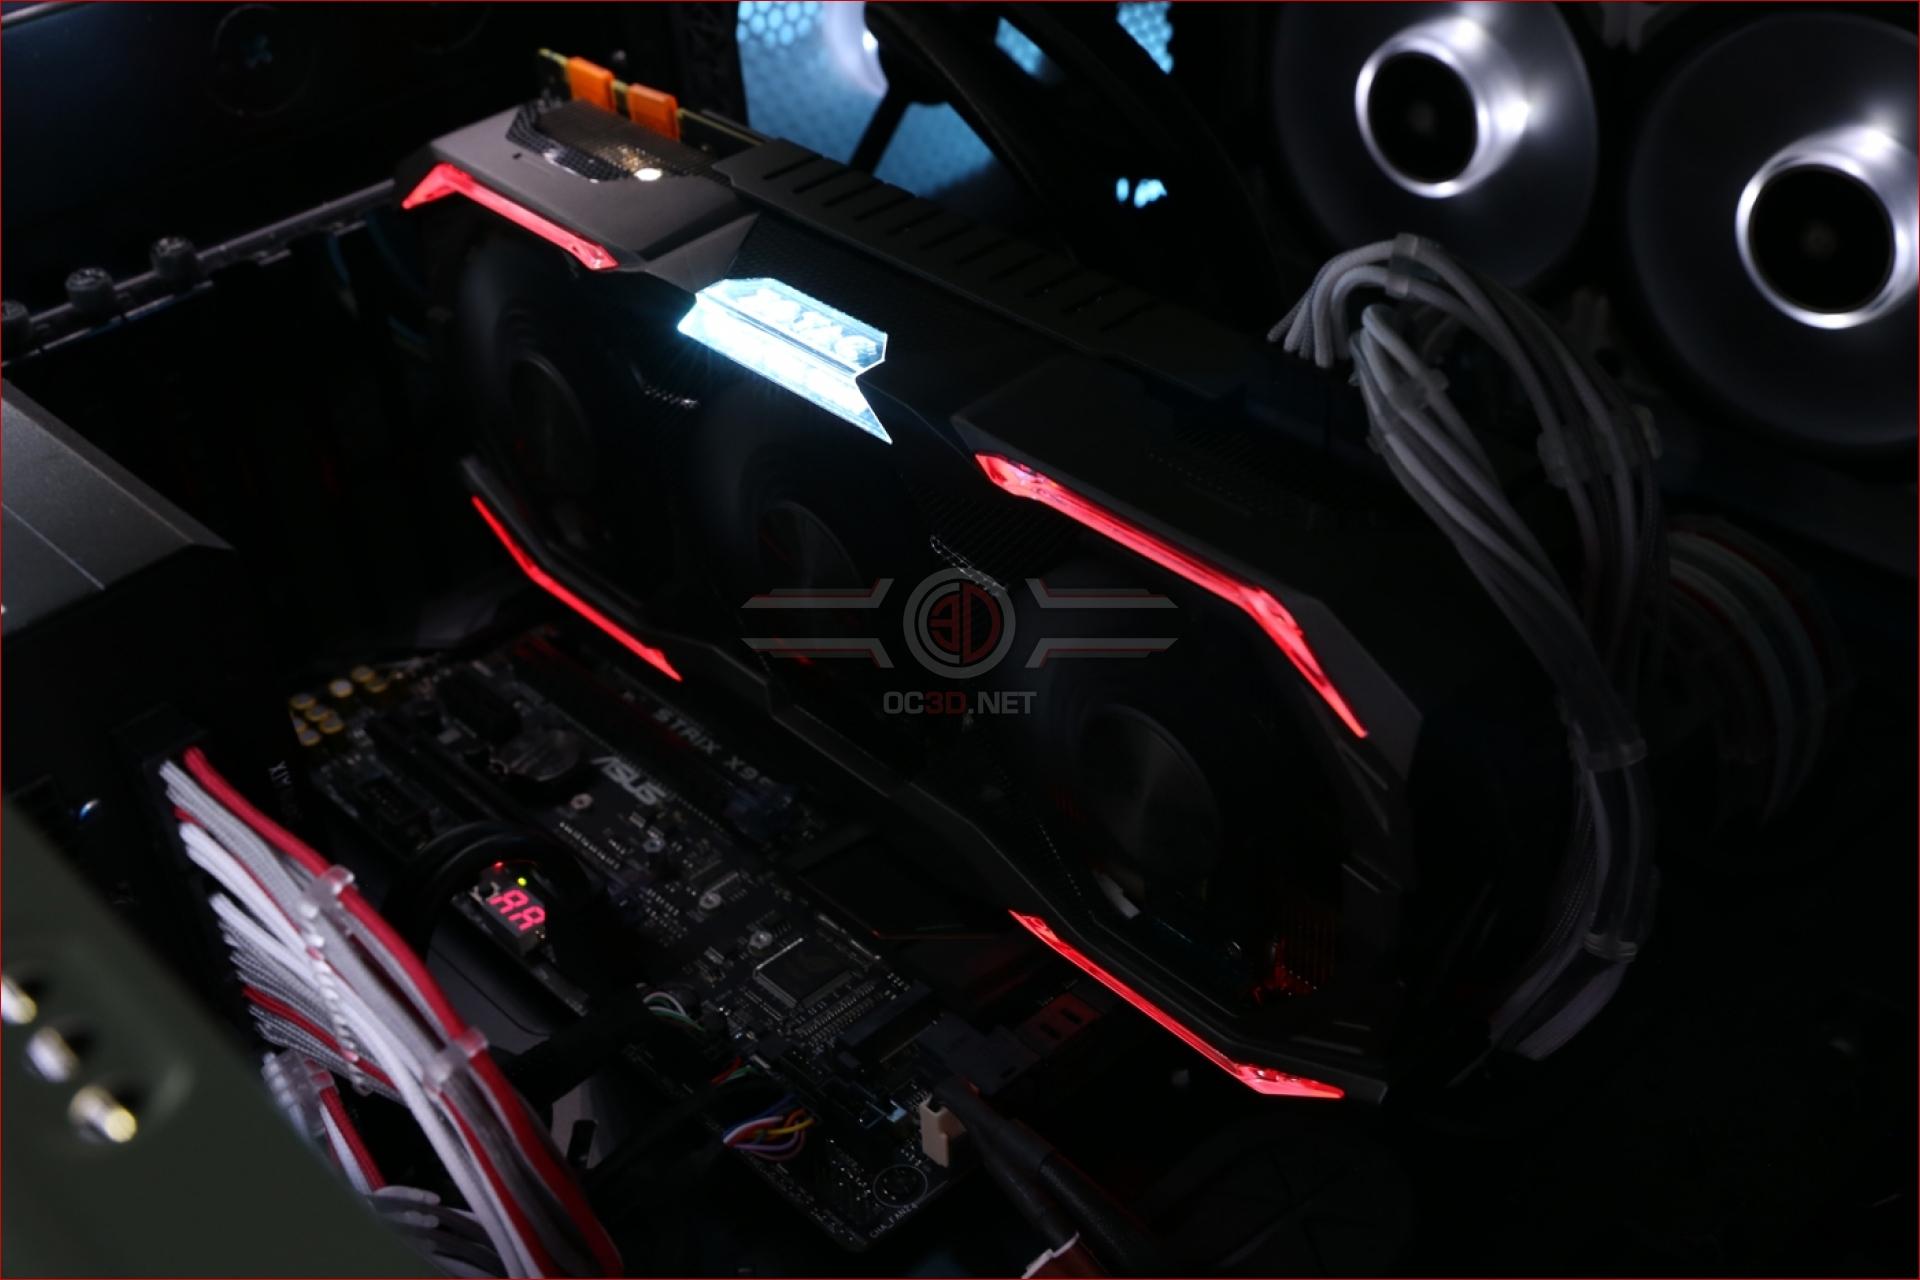 Zotac GTX 1070 Ti AMP! Extreme Review | Lighting | GPU & Displays